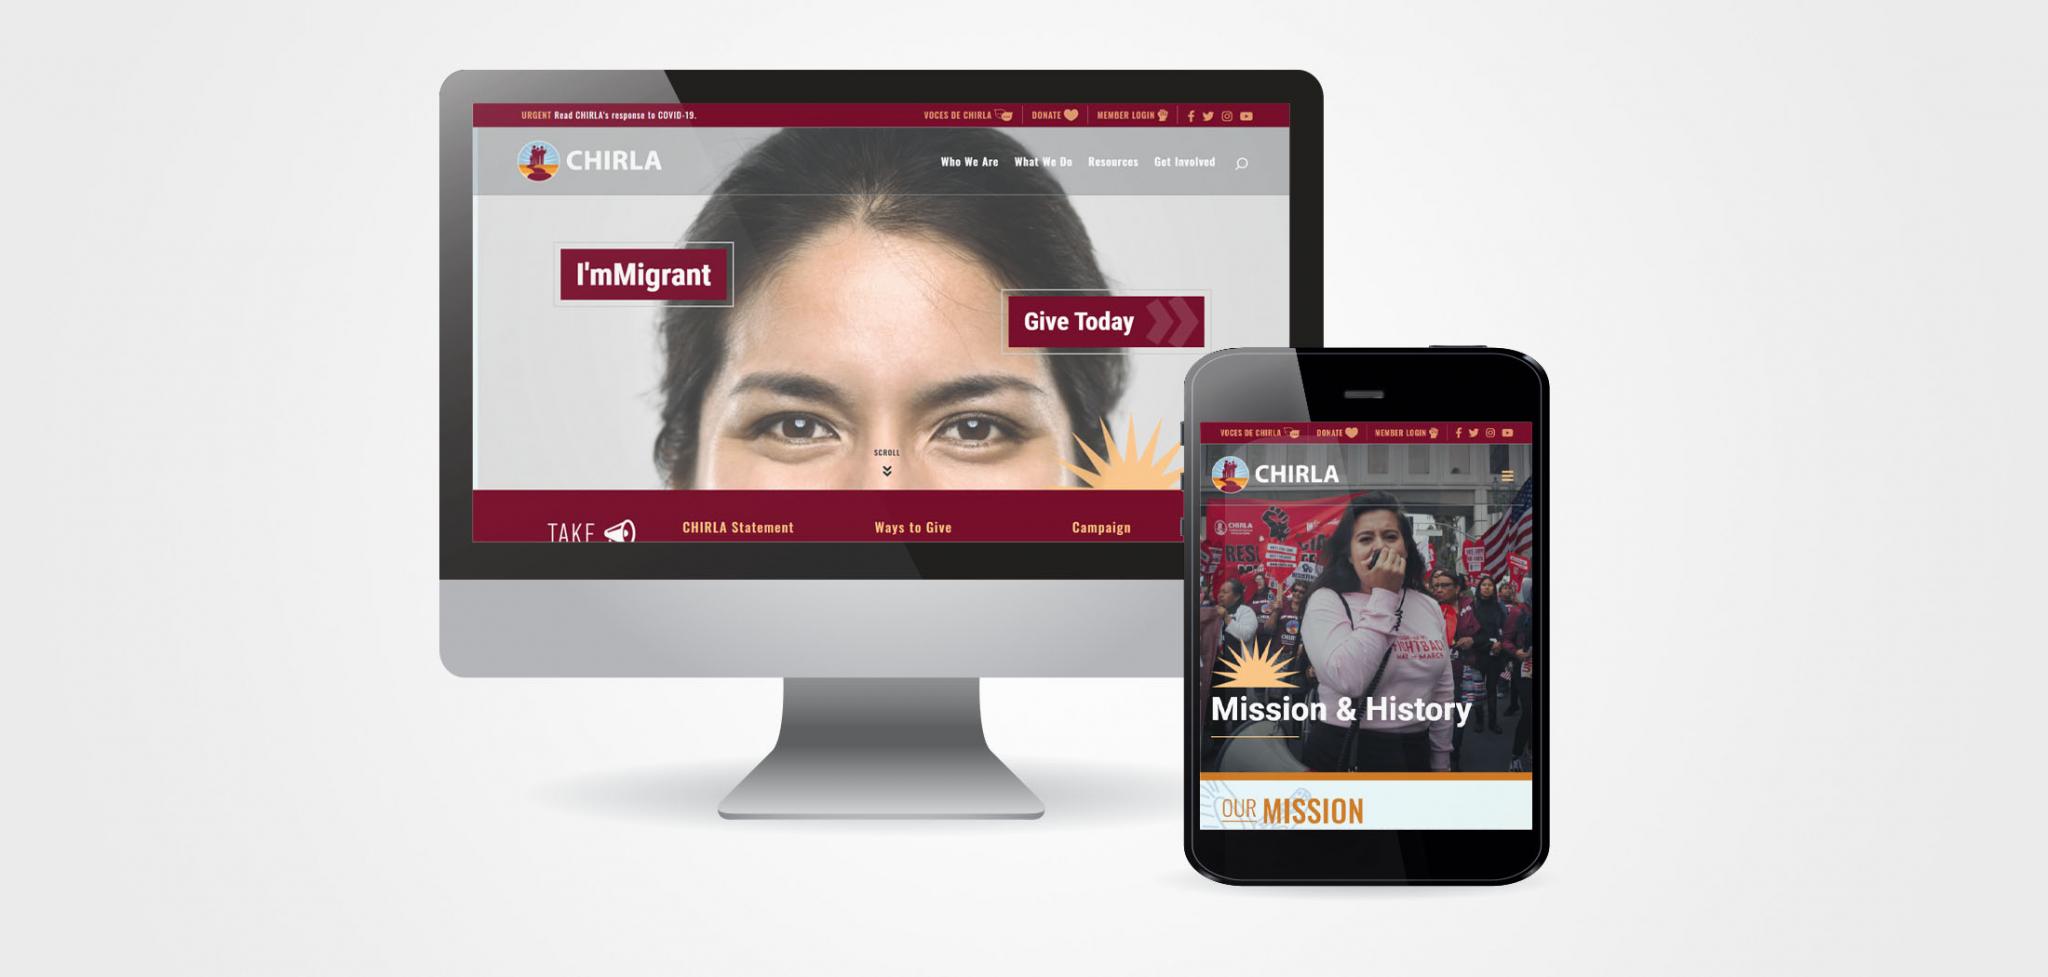 CHIRLA Advocacy Campaign Websites Design